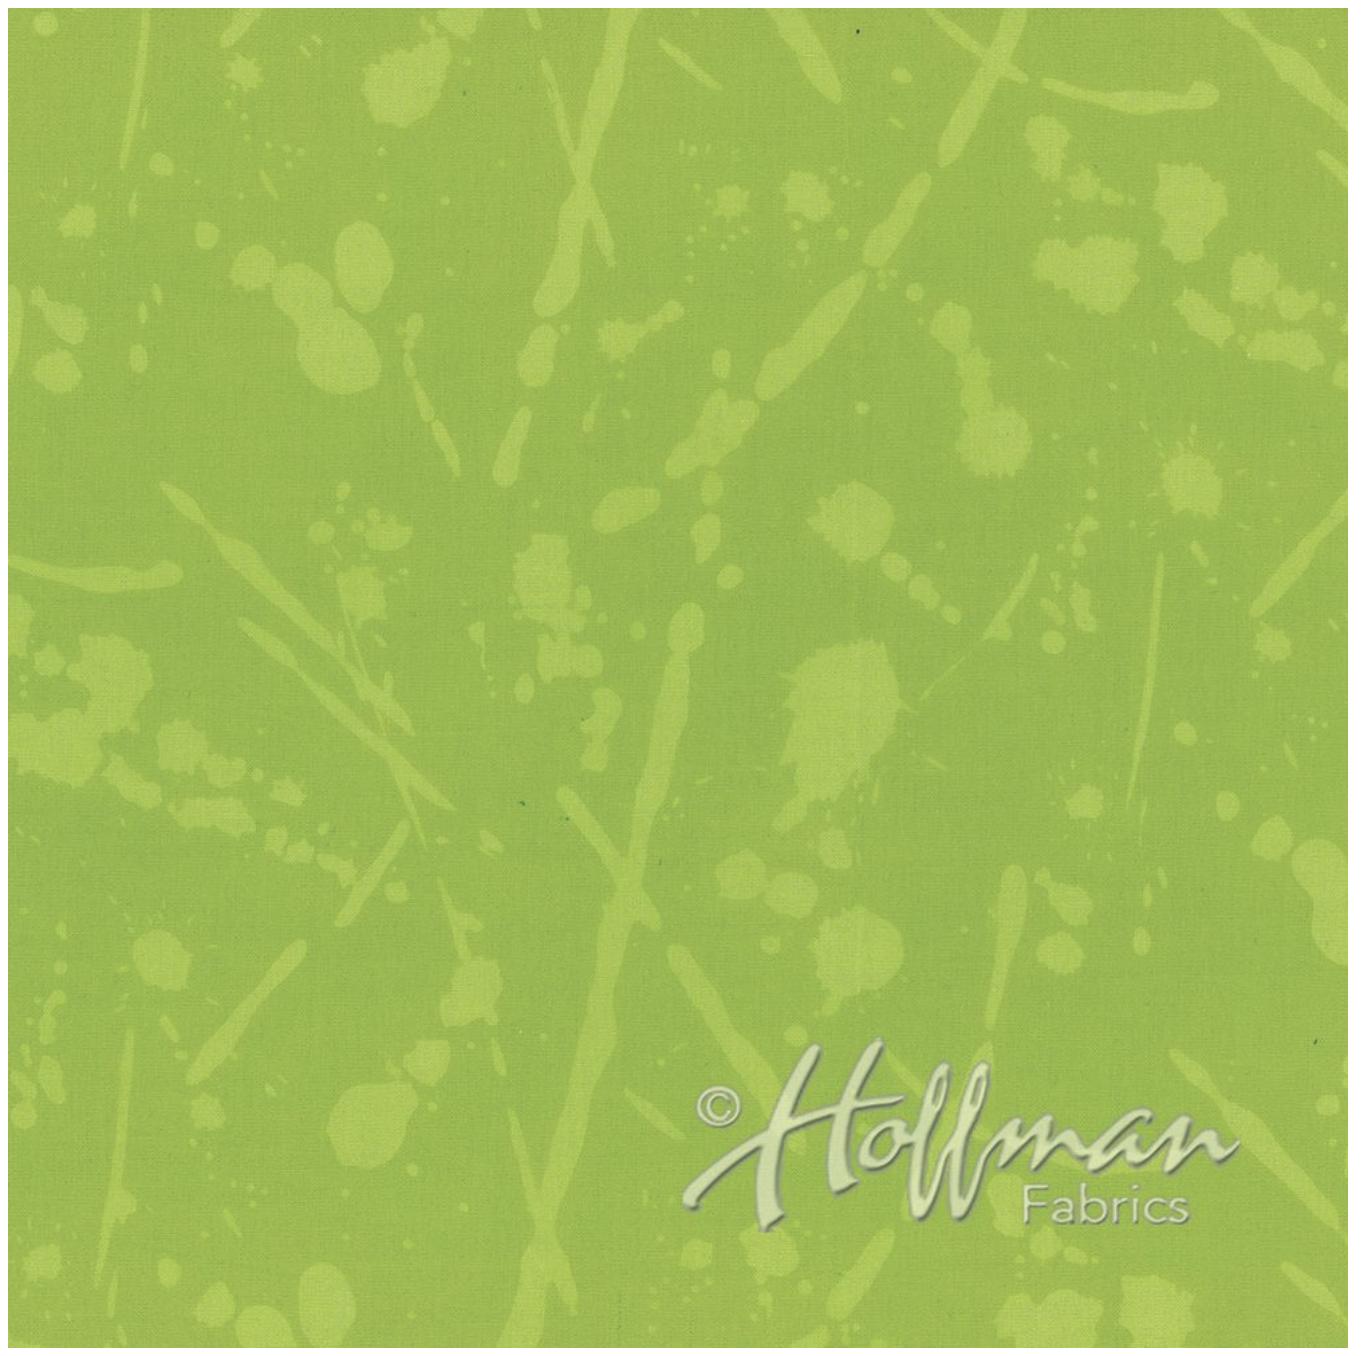 Line Splatter Lime - Hand Dyed Batiks - Me + You Hoffman Fabrics 152-71